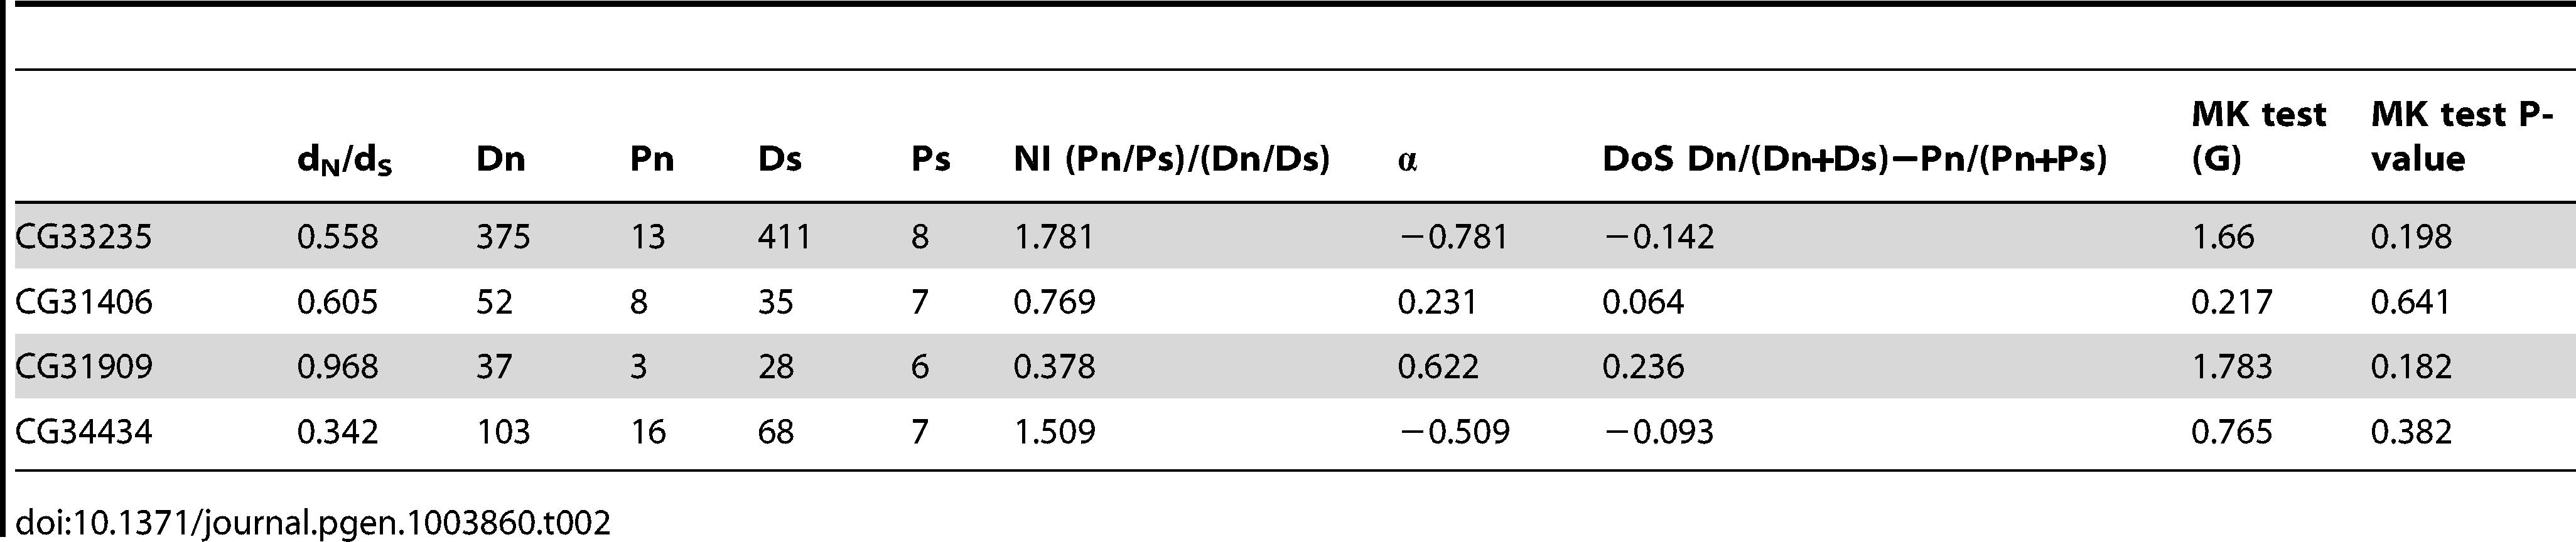 Neutrality index and direction of selection estimates for four <i>de novo</i> genes.